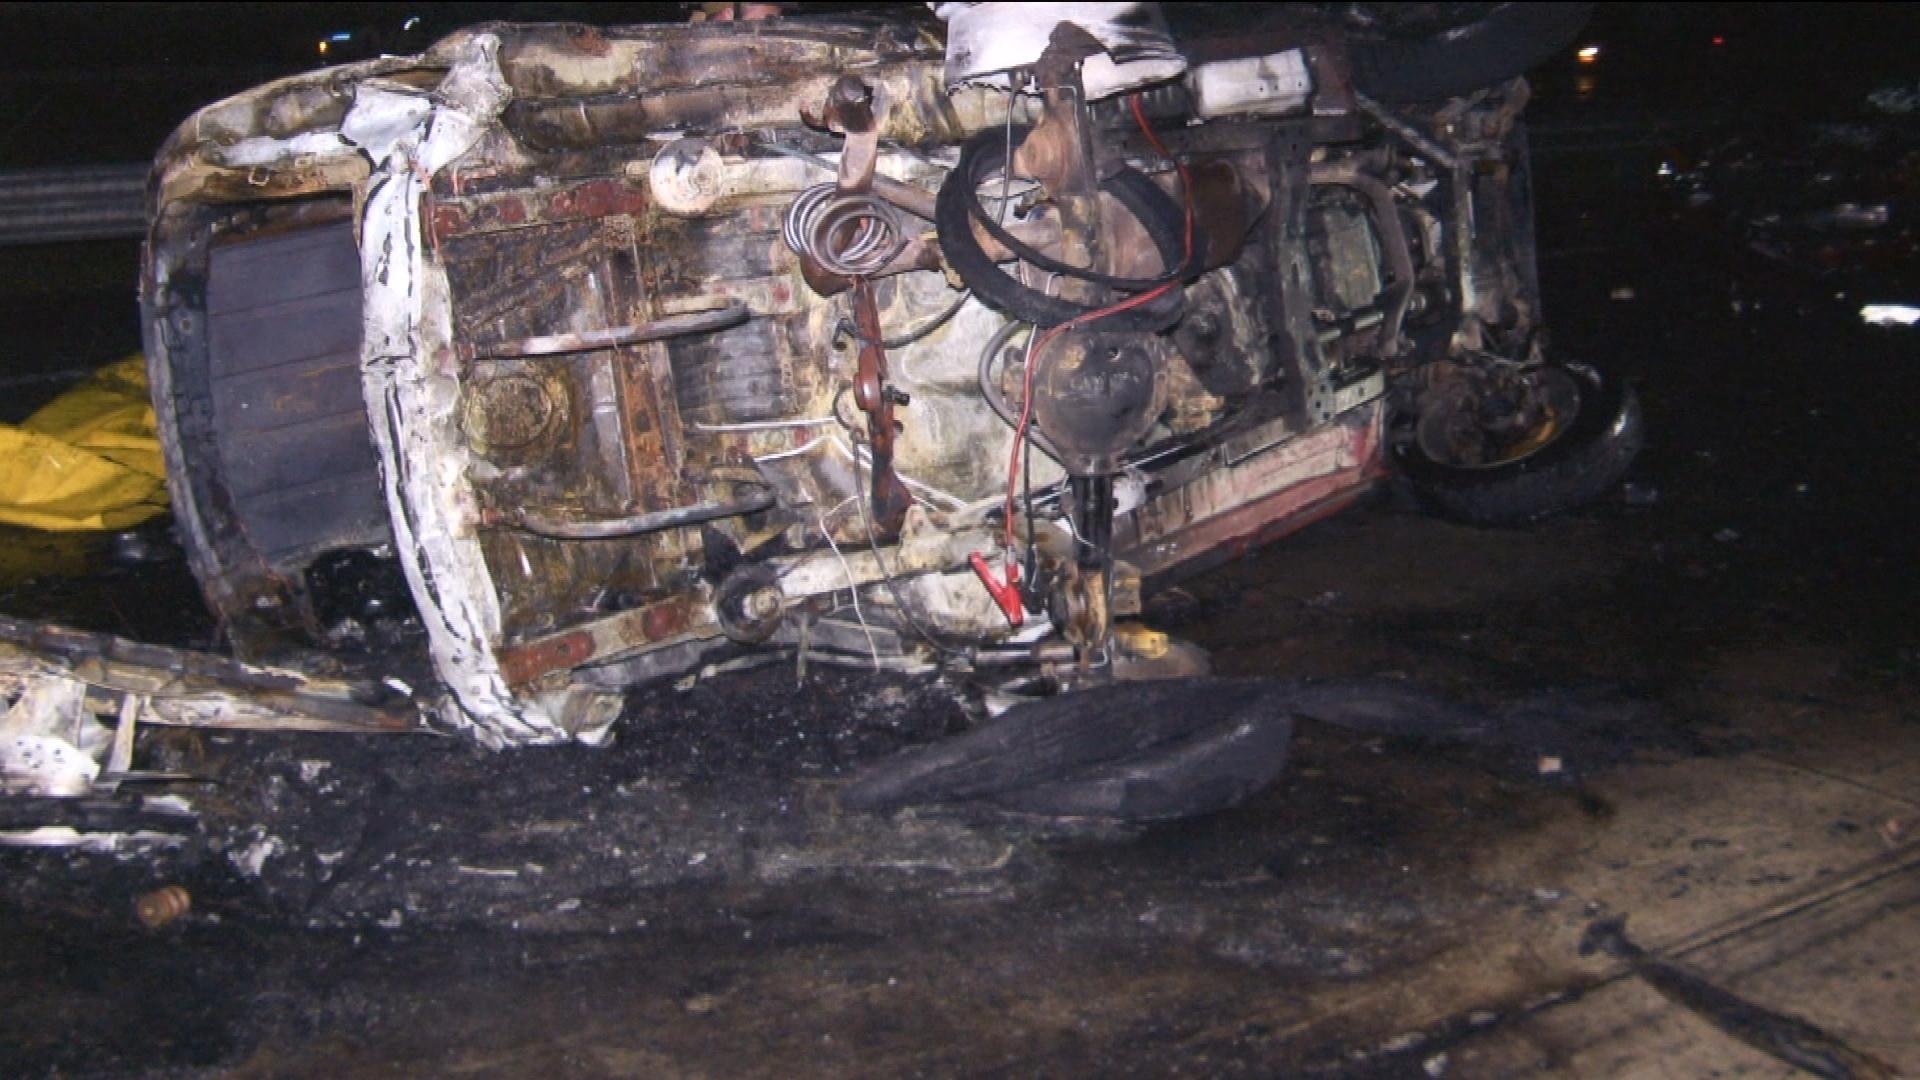 Chrysler Jeep Recall From Gas Tank Fires Still Raising